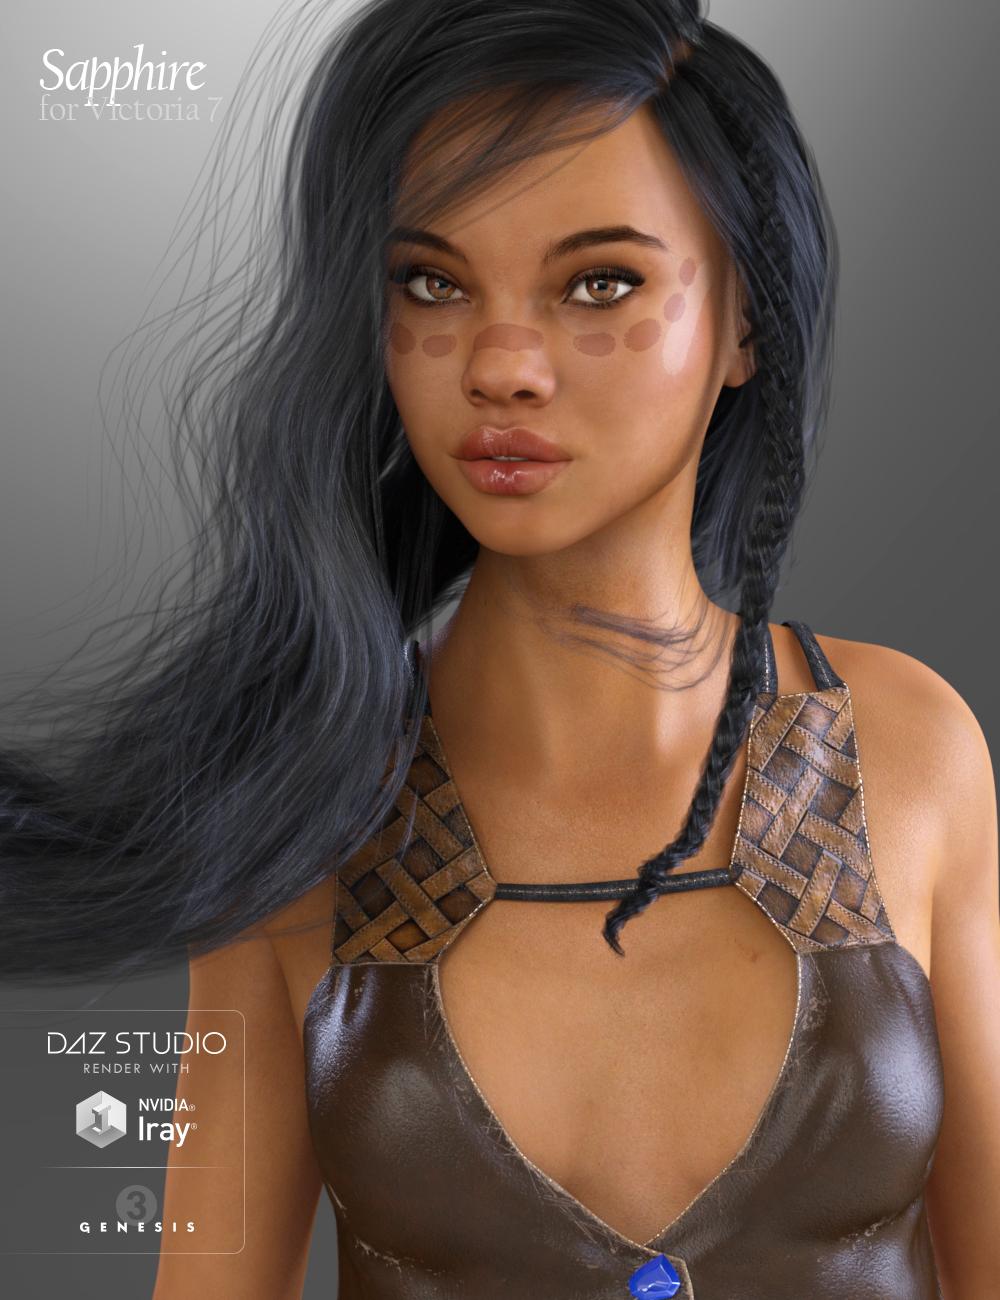 Sapphire HD for Victoria 7 by: Raiya, 3D Models by Daz 3D